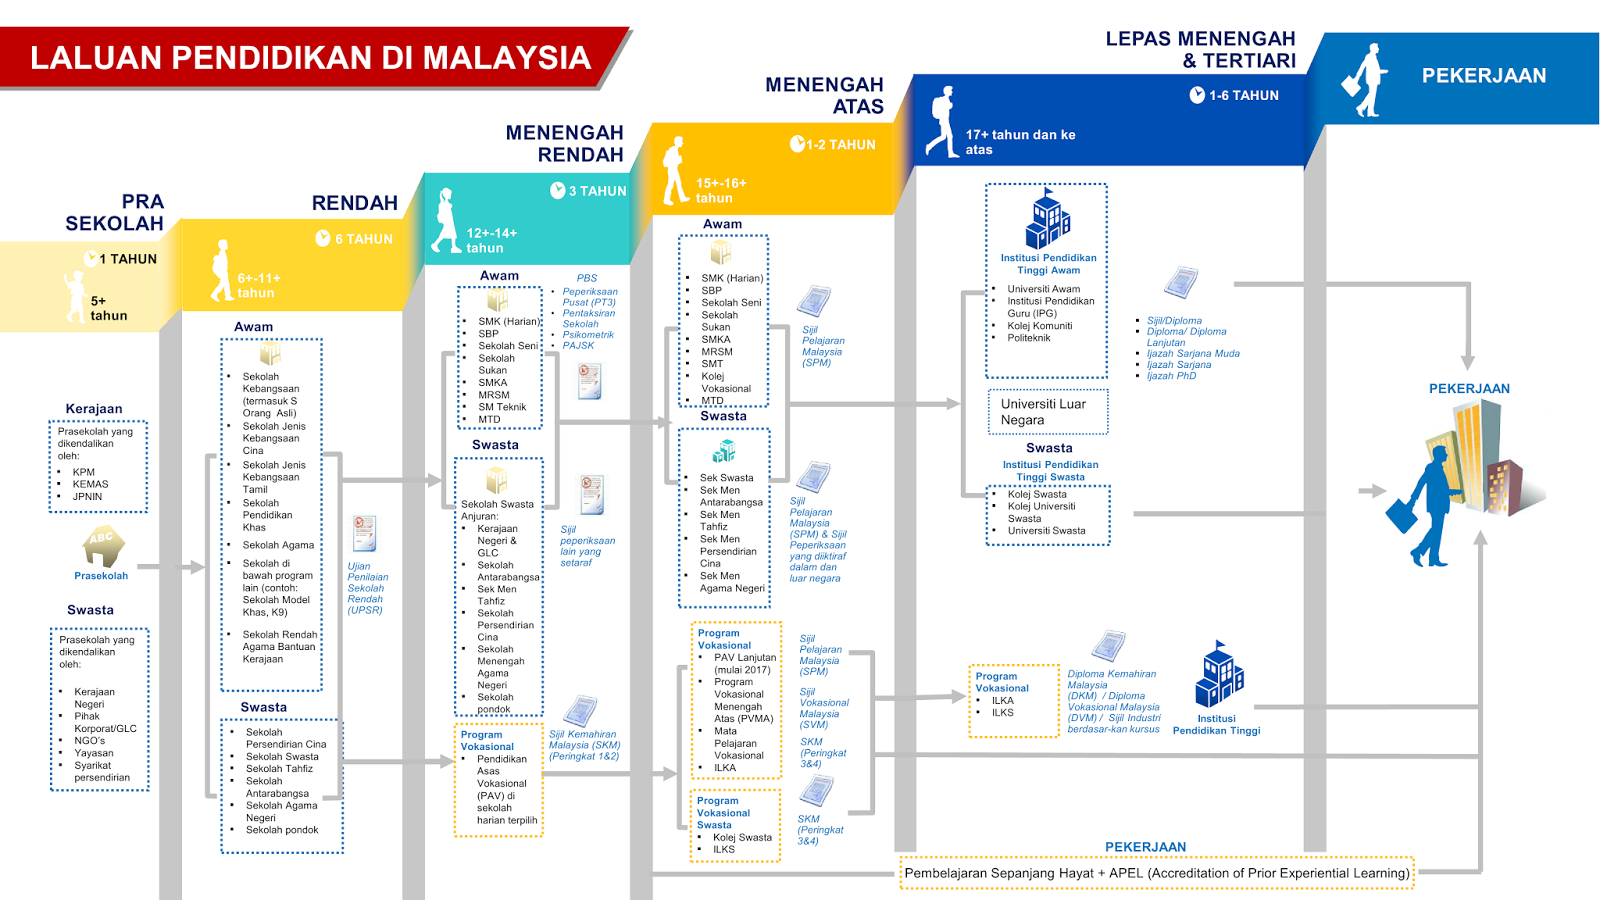 Infografik Laluan Pendidikan Di Malaysia